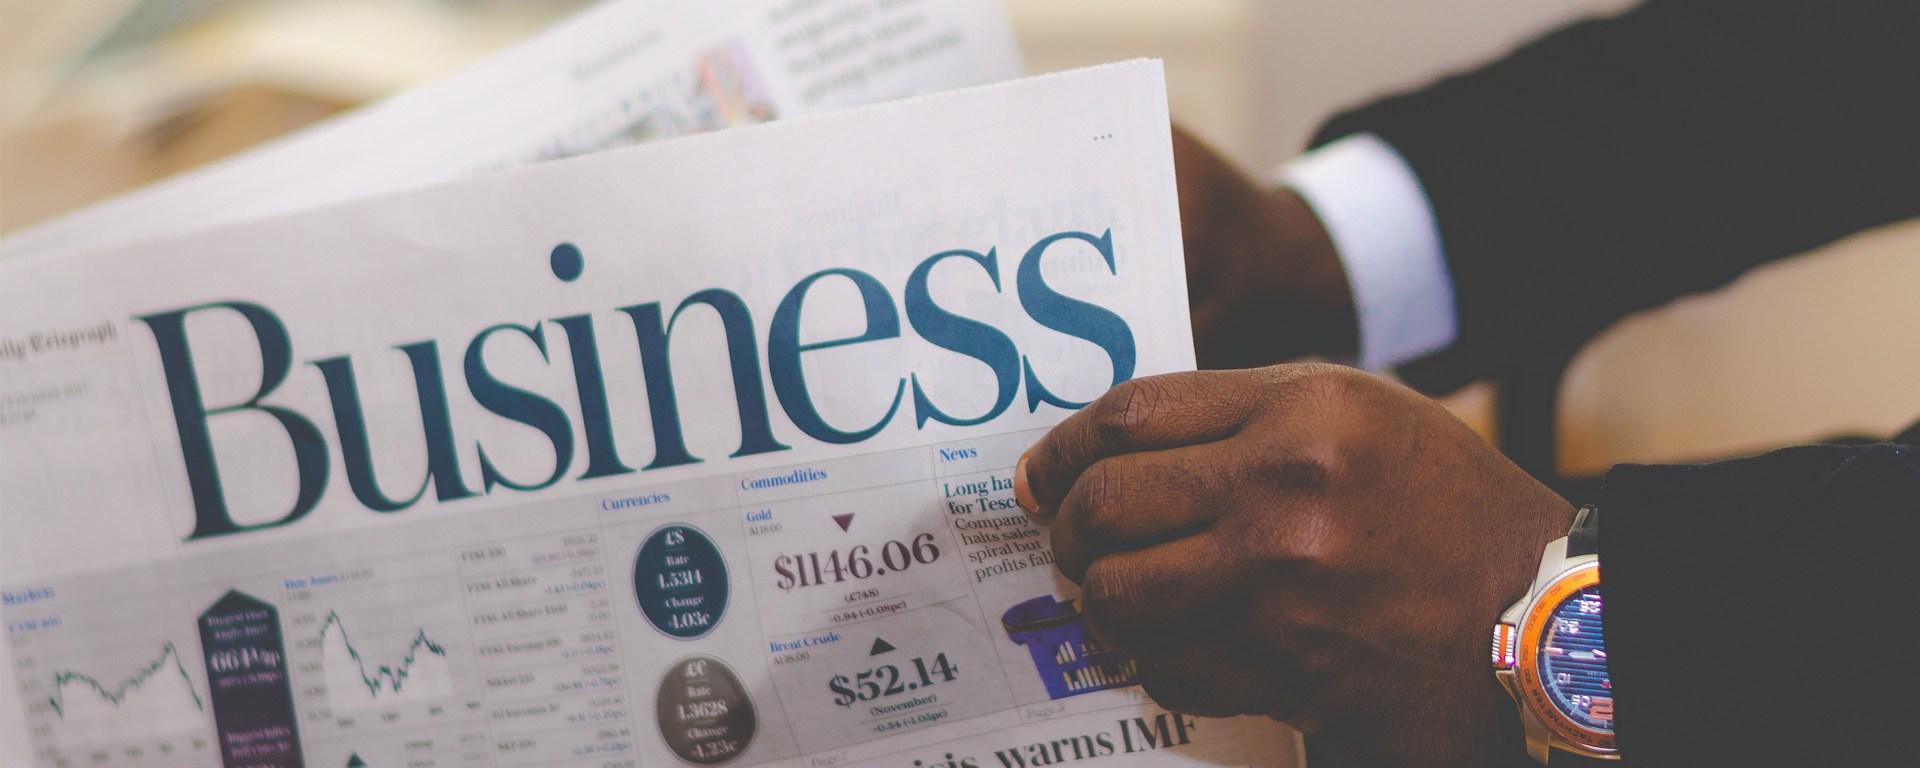 business leadership program connecticut